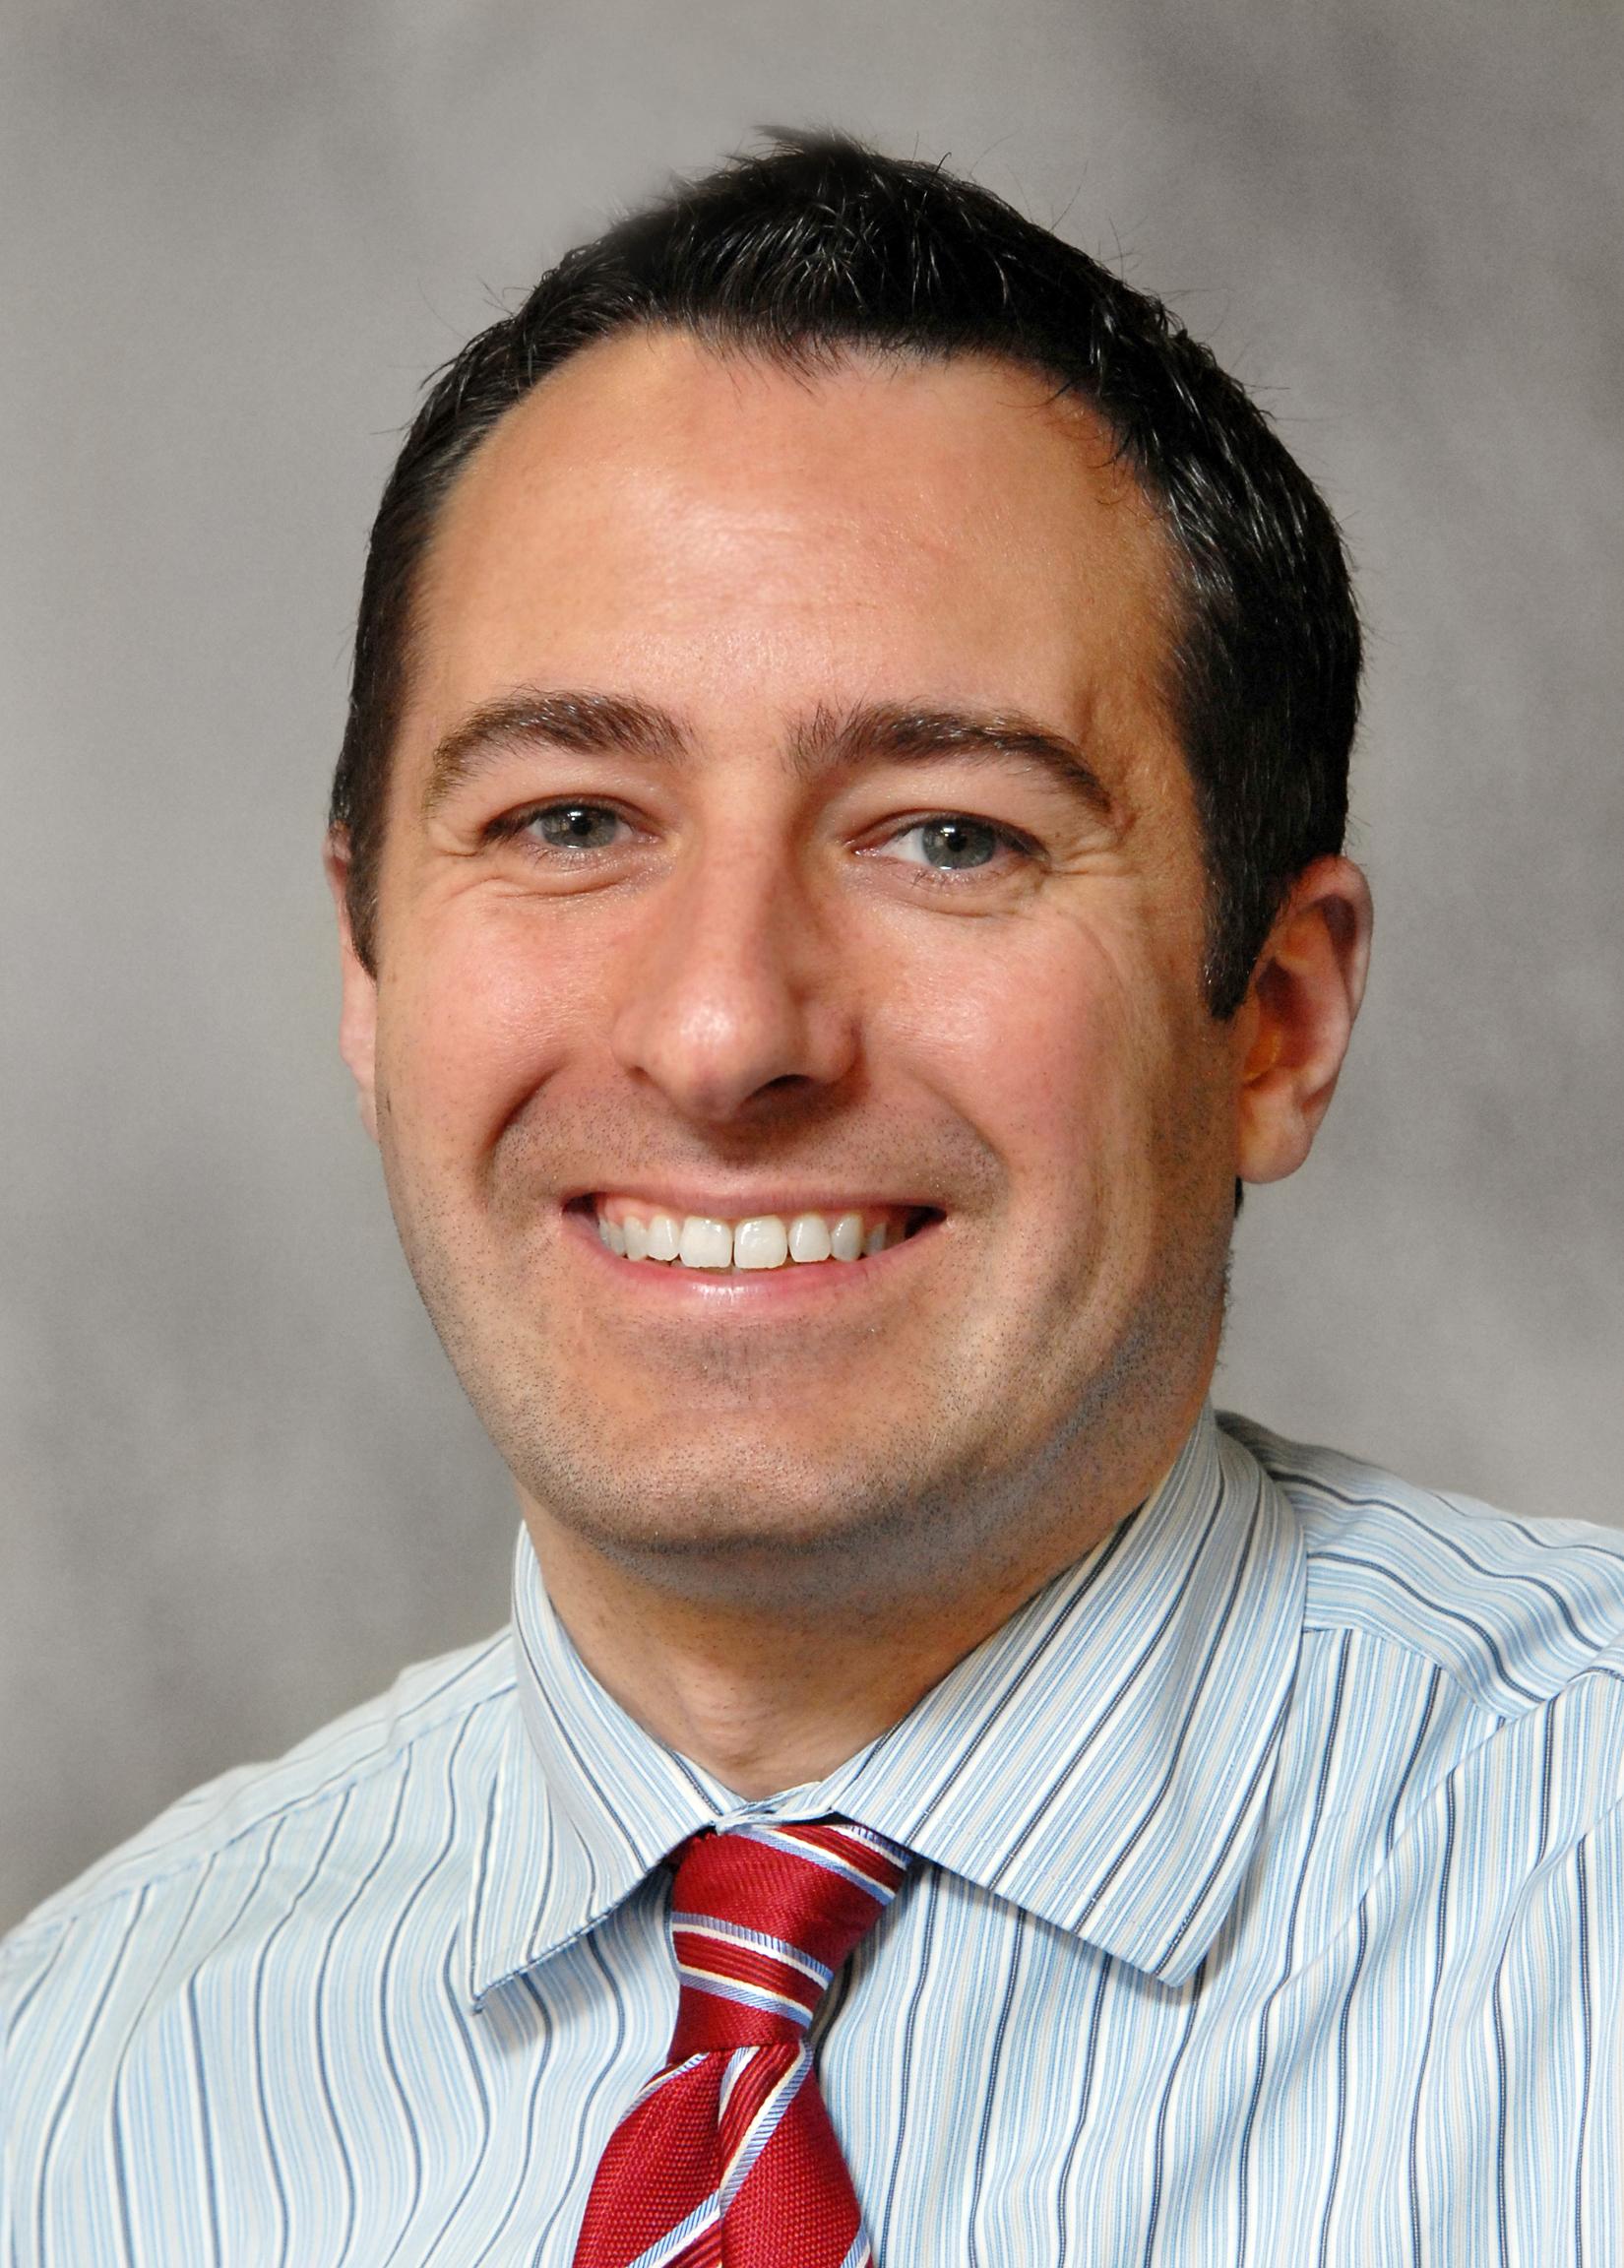 Michael Aylward, MD, FACP